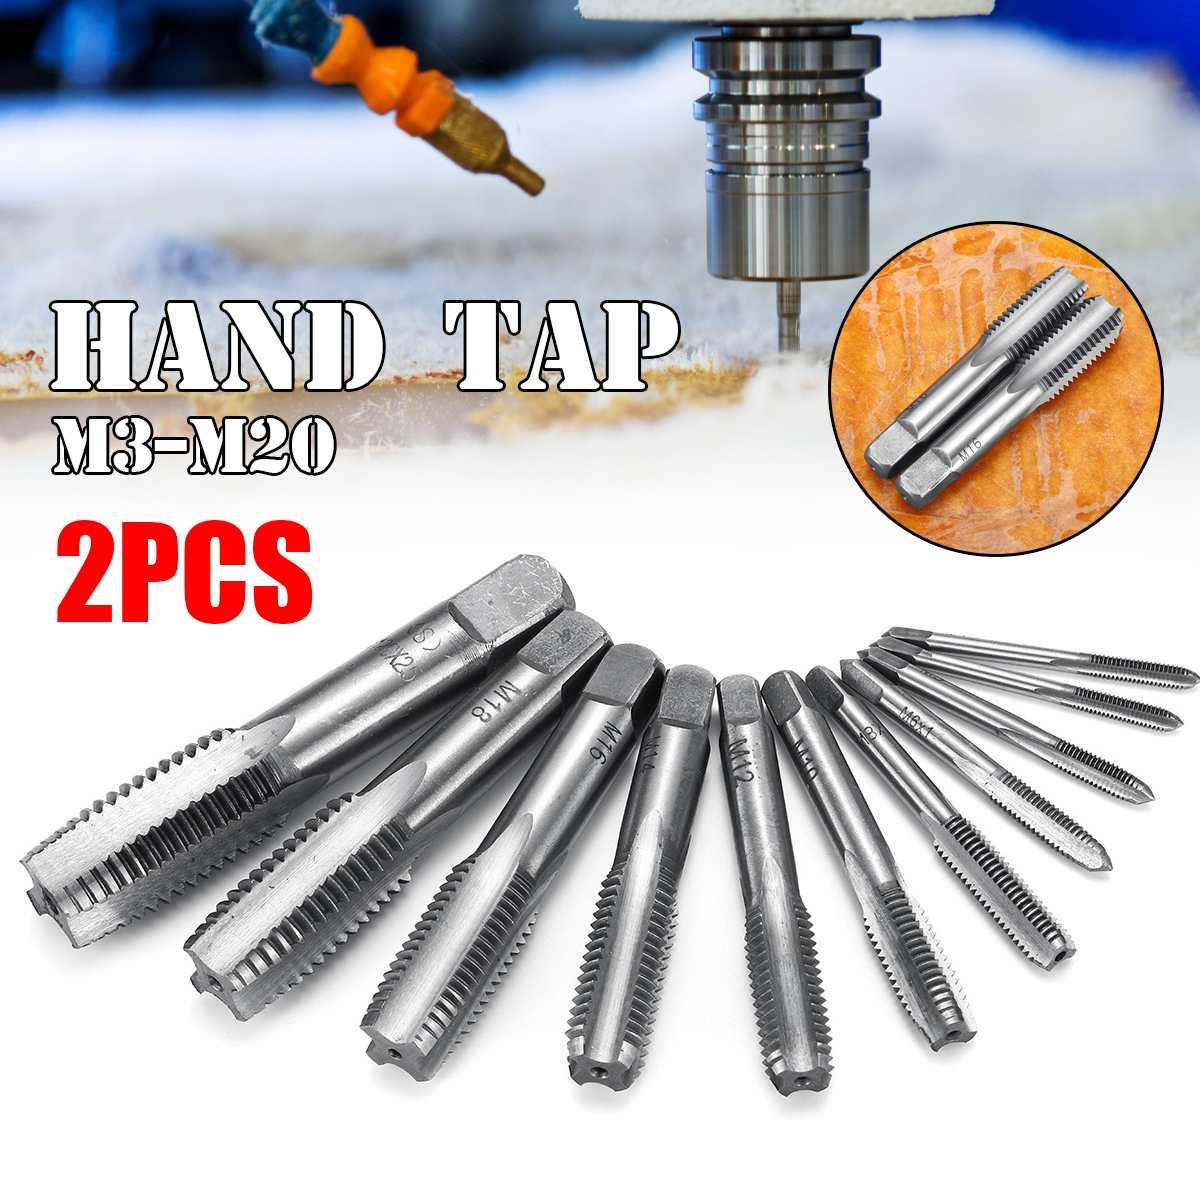 M1.7 X 0.35 HSS INTERMEDIATE HAND SCREW TAP